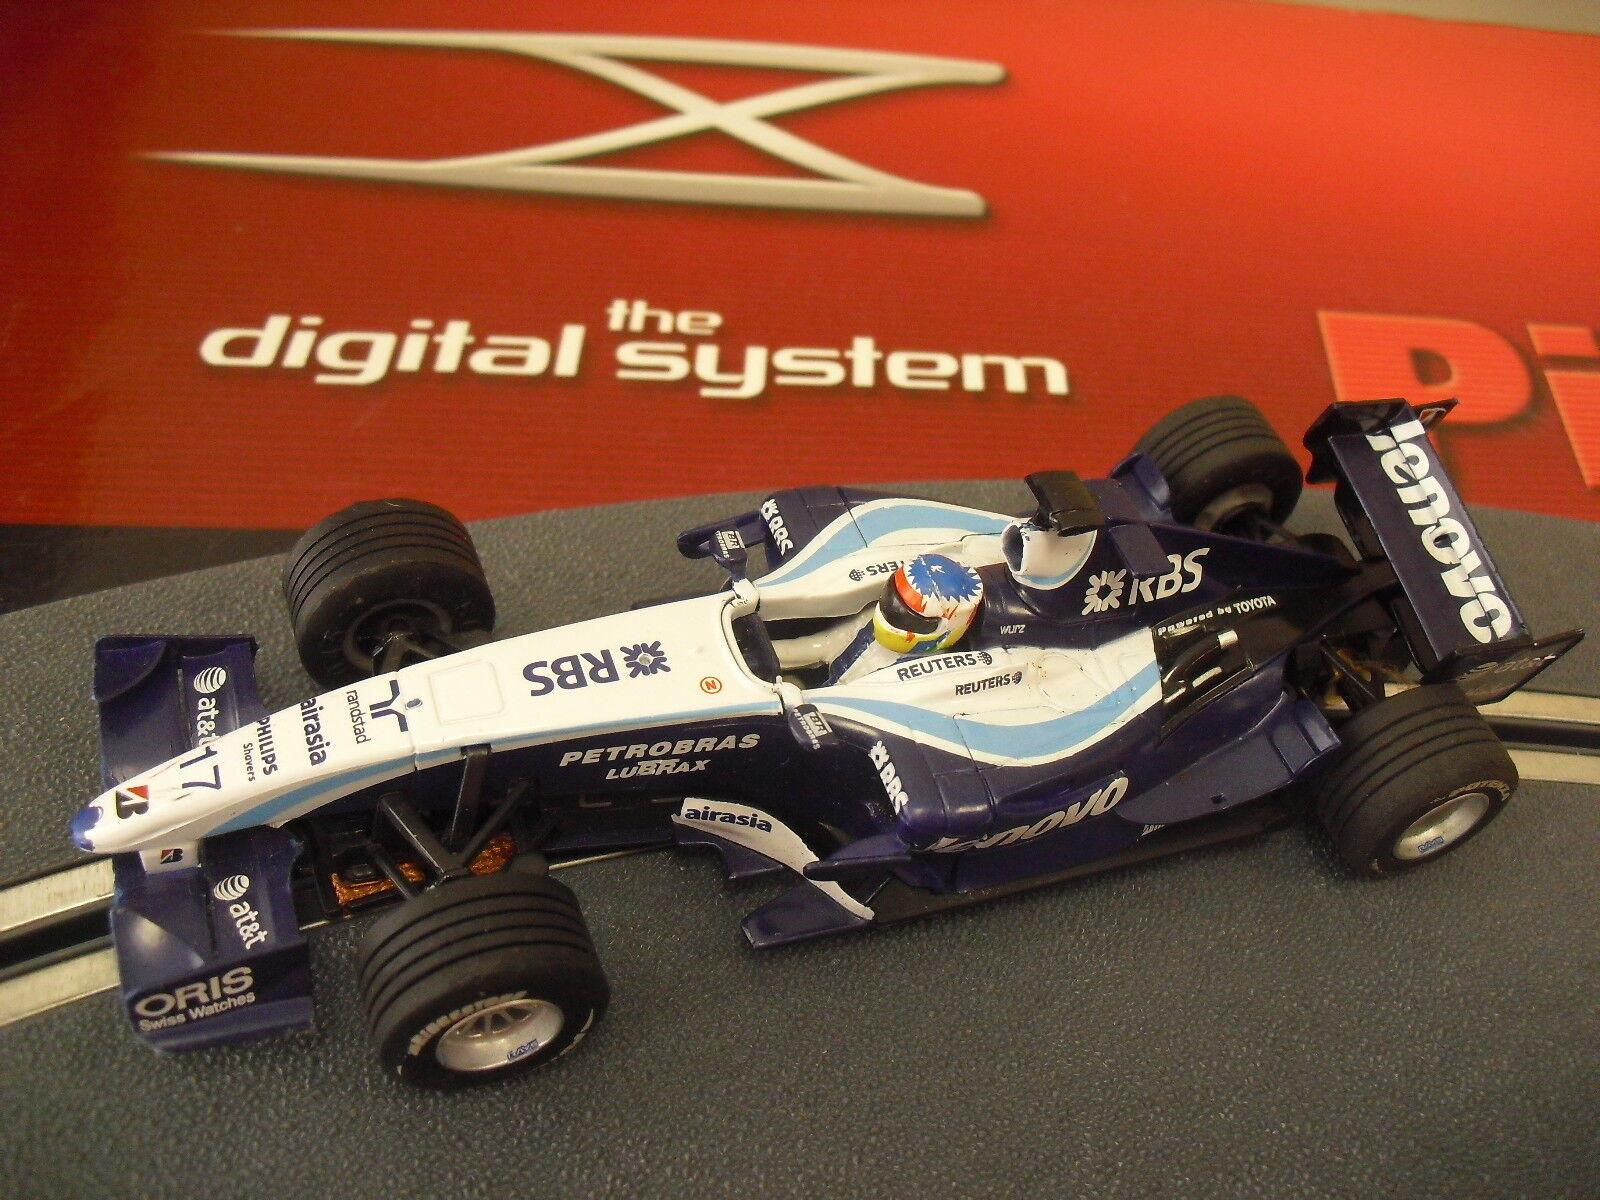 Scalextric Williams F1 Fw28 Digital System New 1 32 senza Scatola